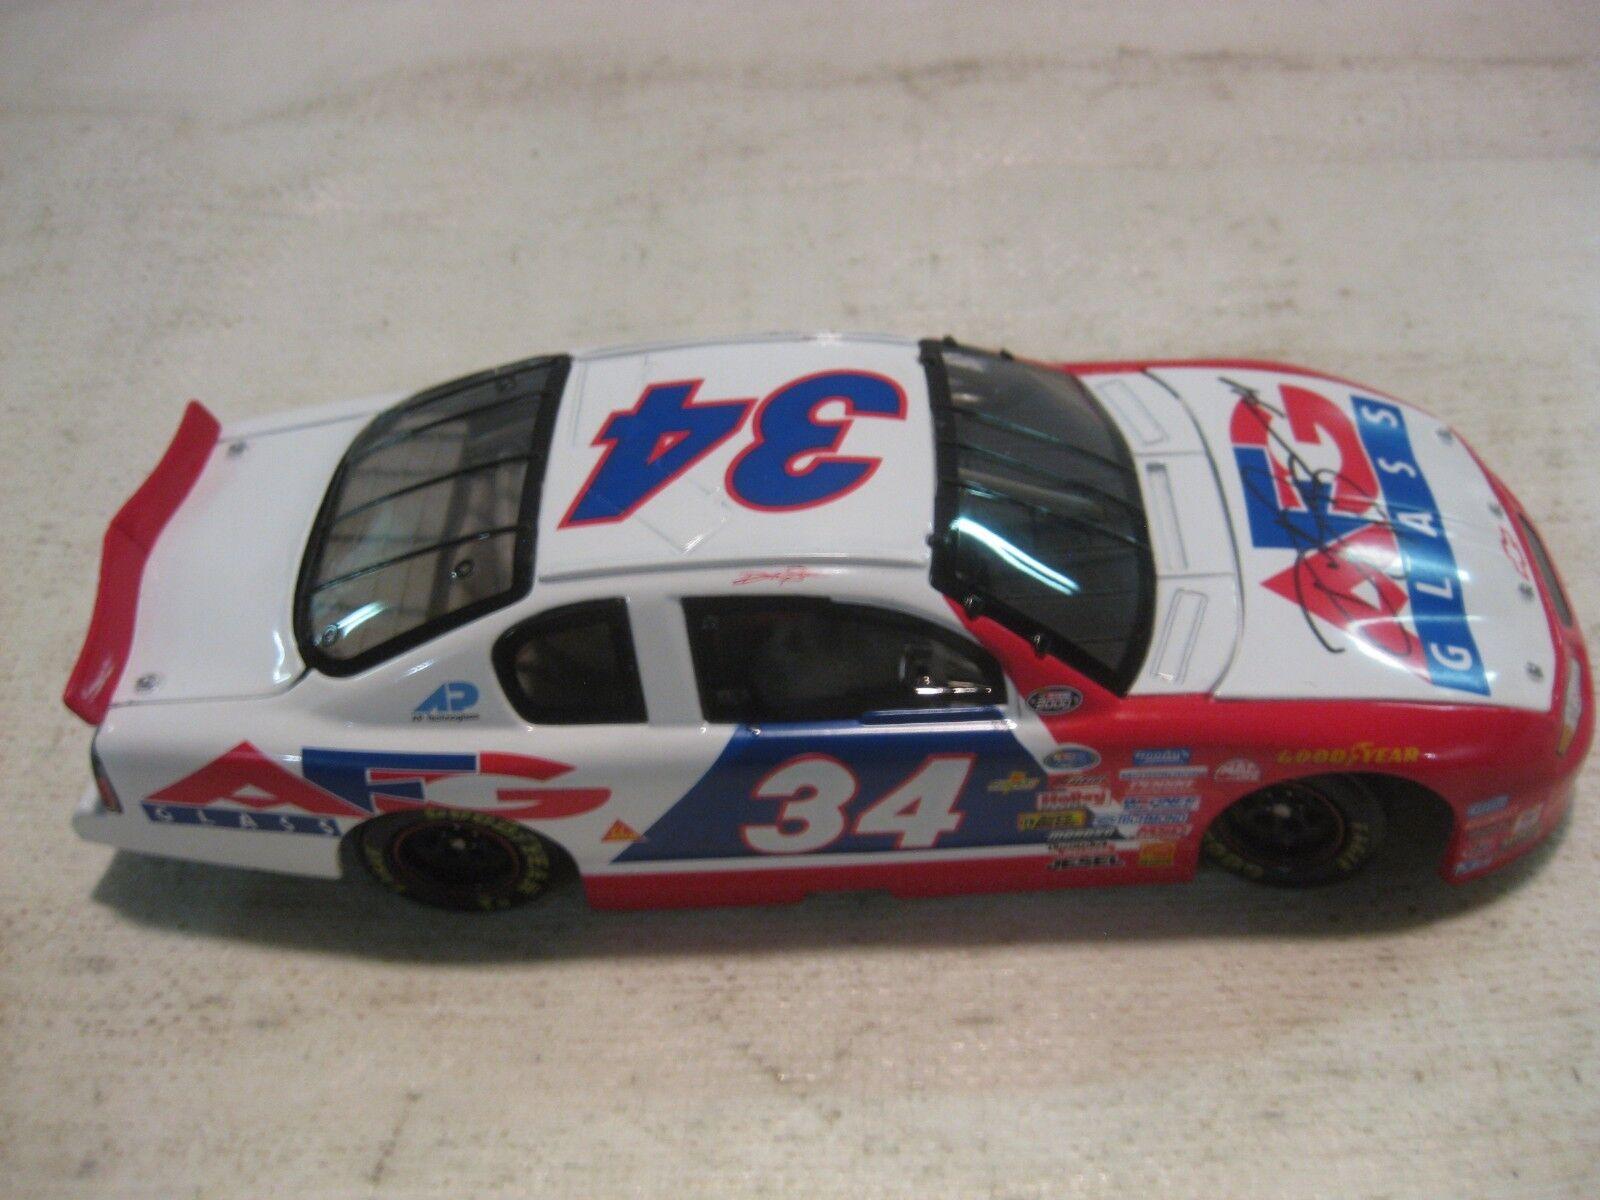 Nascar David Green AFG Glass Chevy Monte Carlo 124 Scale Diecast 2000 dc671